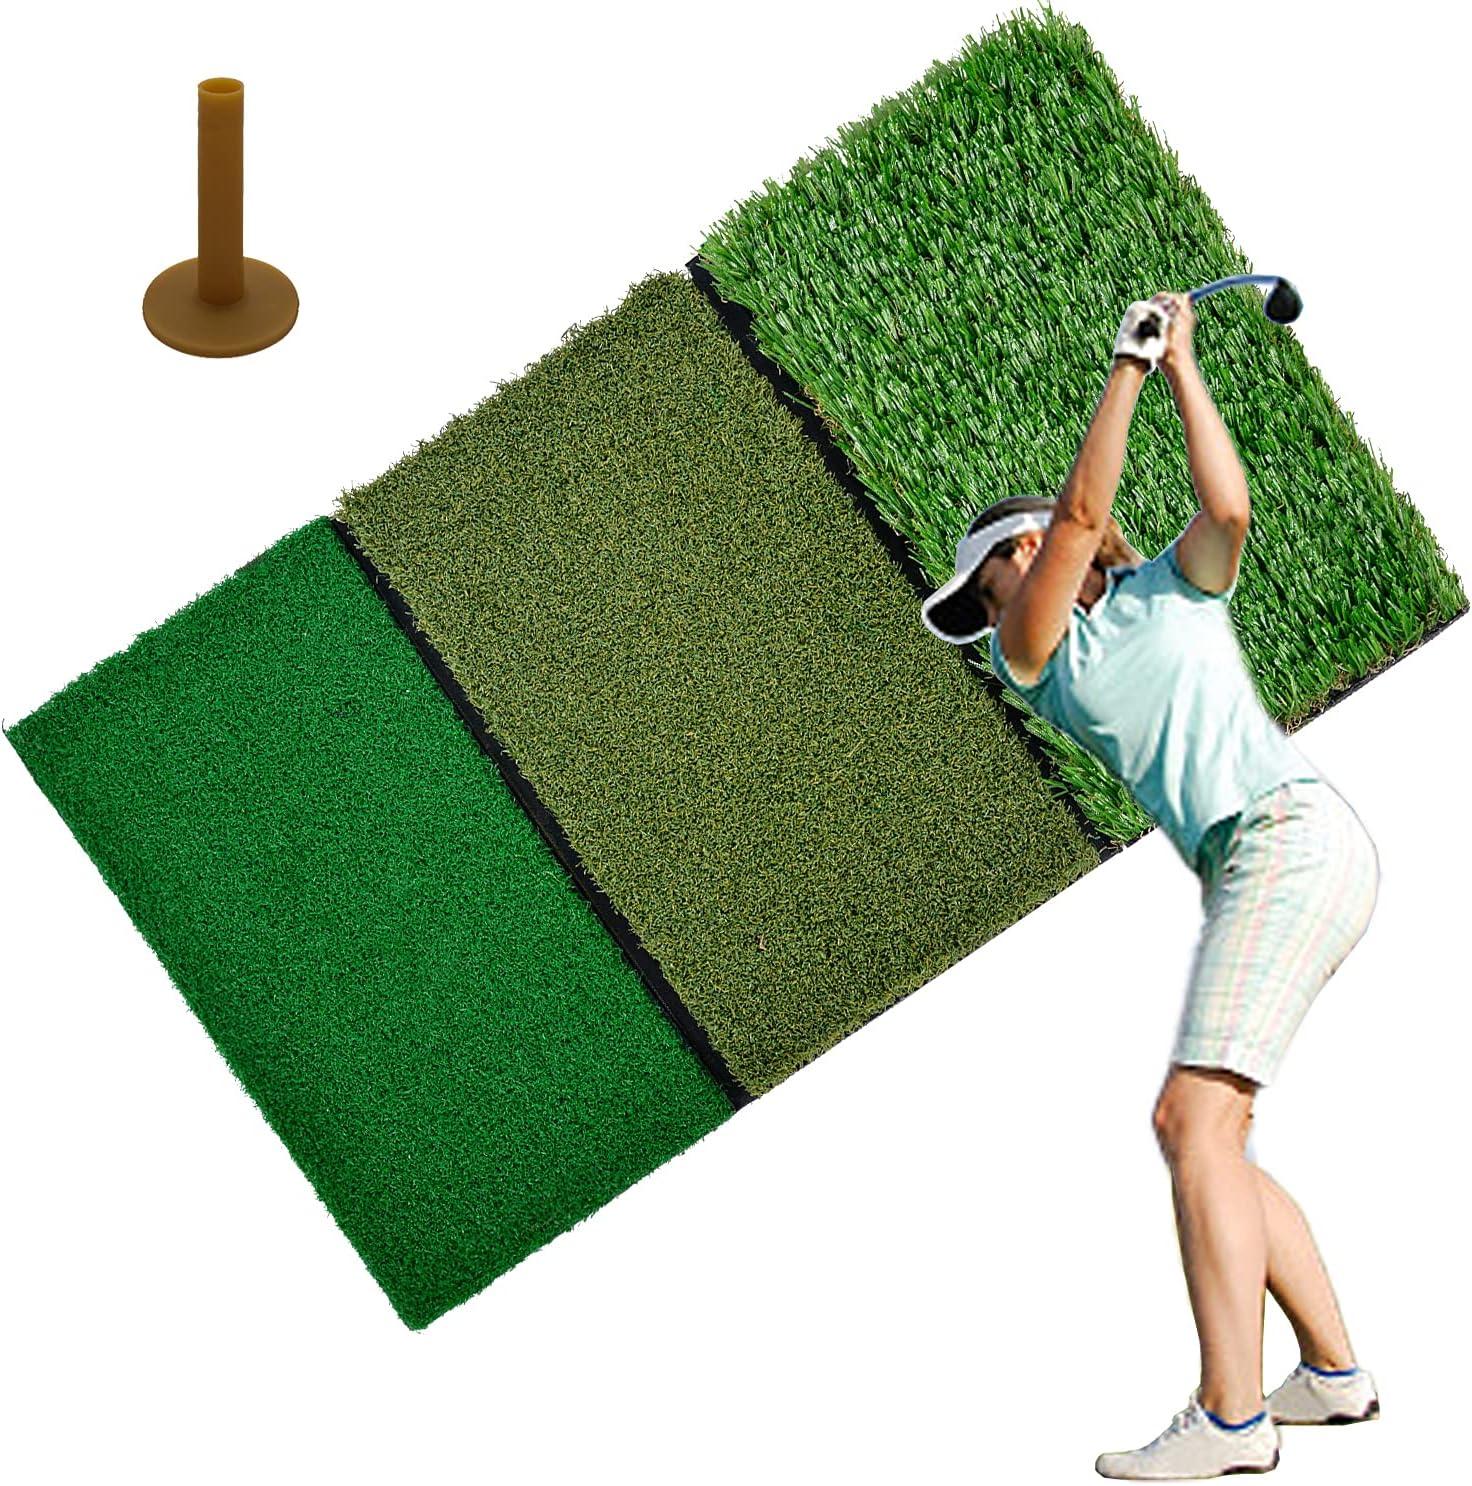 Doubleriver Golf San Francisco Max 55% OFF Mall Hitting Practice Mat Turf